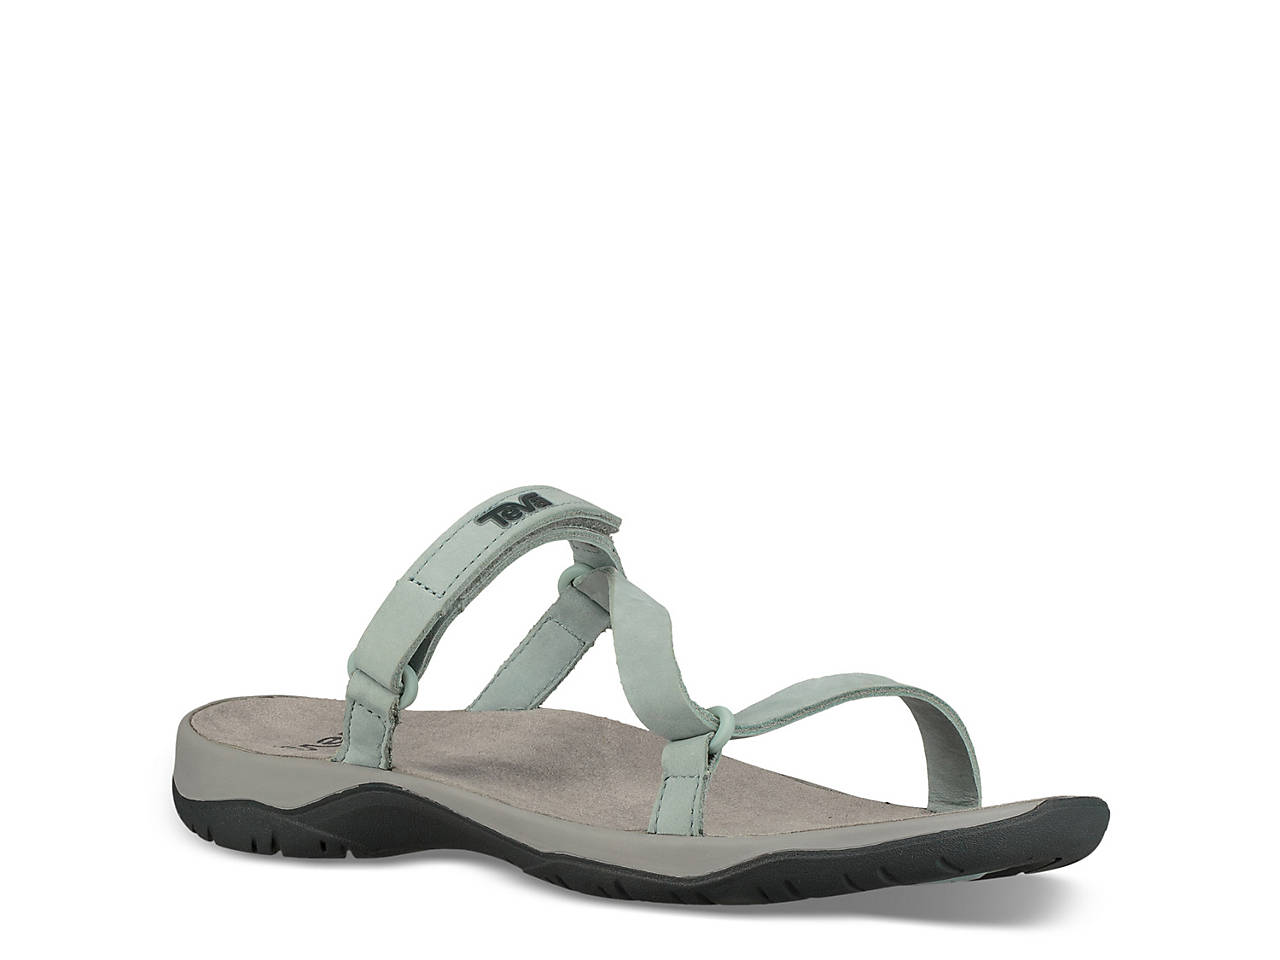 8a13b32f7 Teva Elzada Sandal Women s Shoes